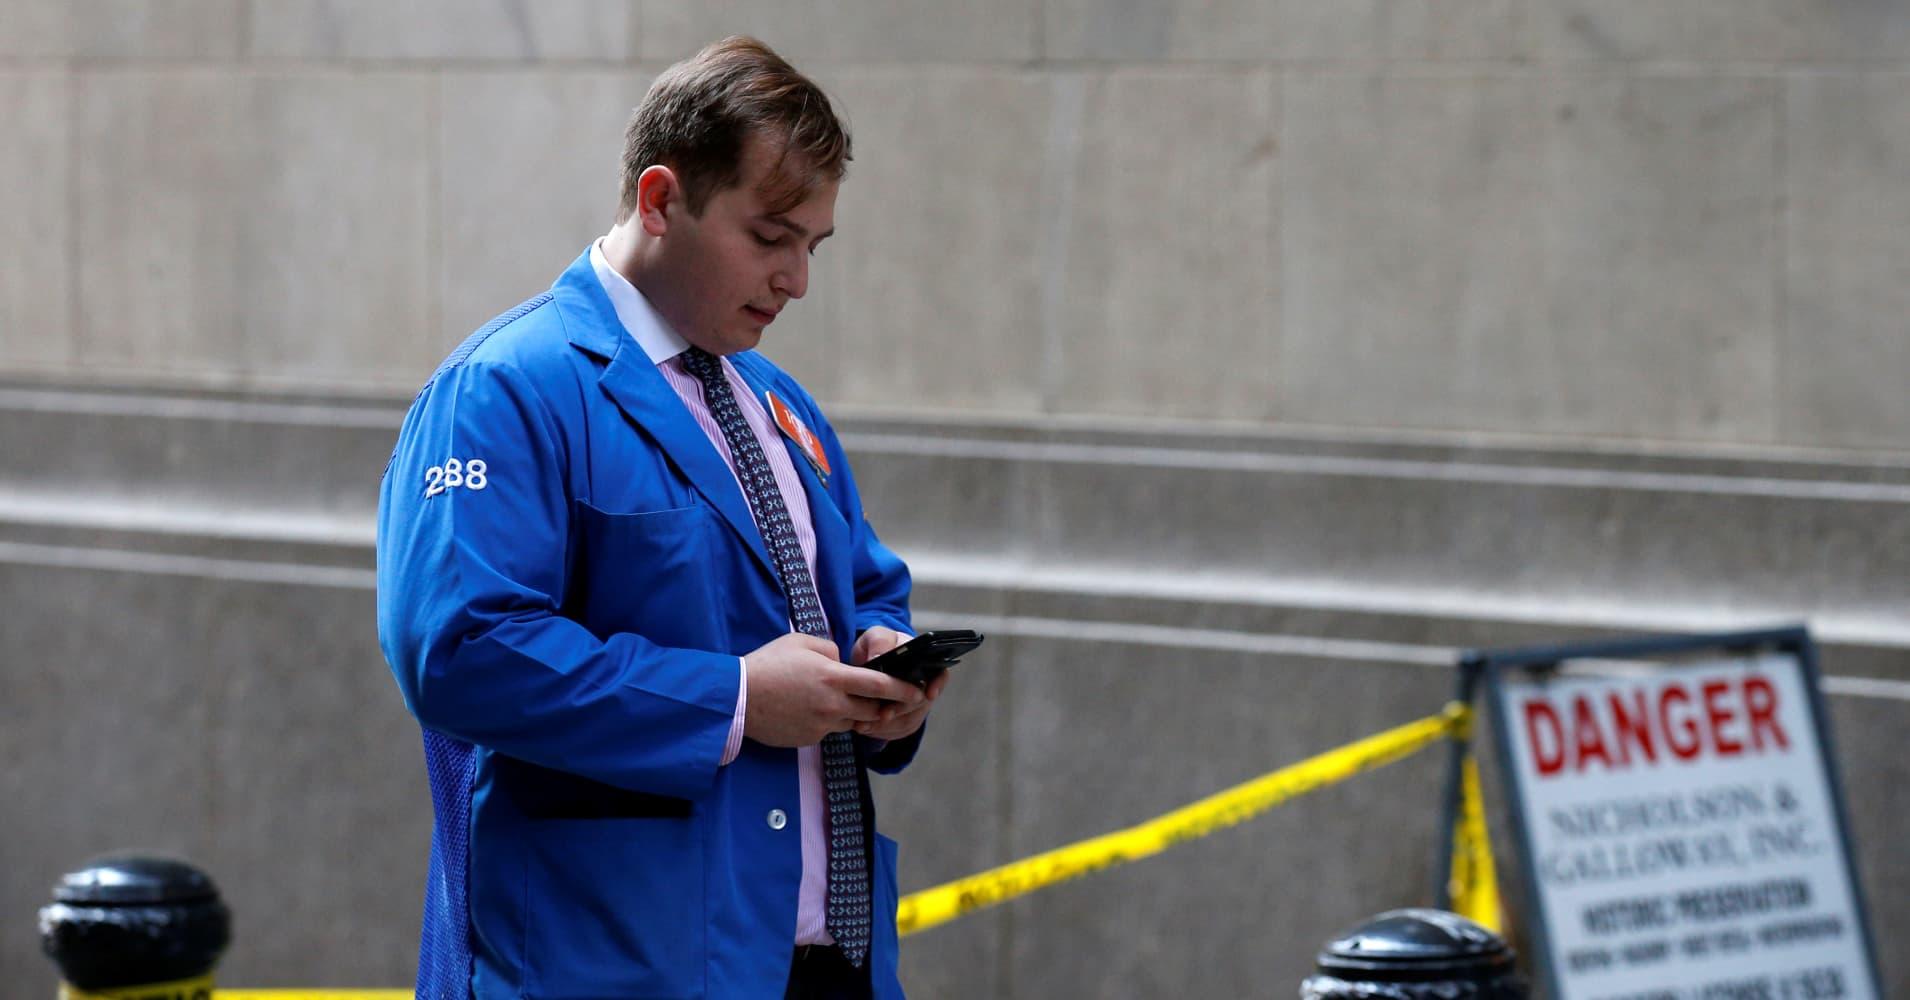 A 10 to 30 percent market drop could hit Wall Street, David Tice warns